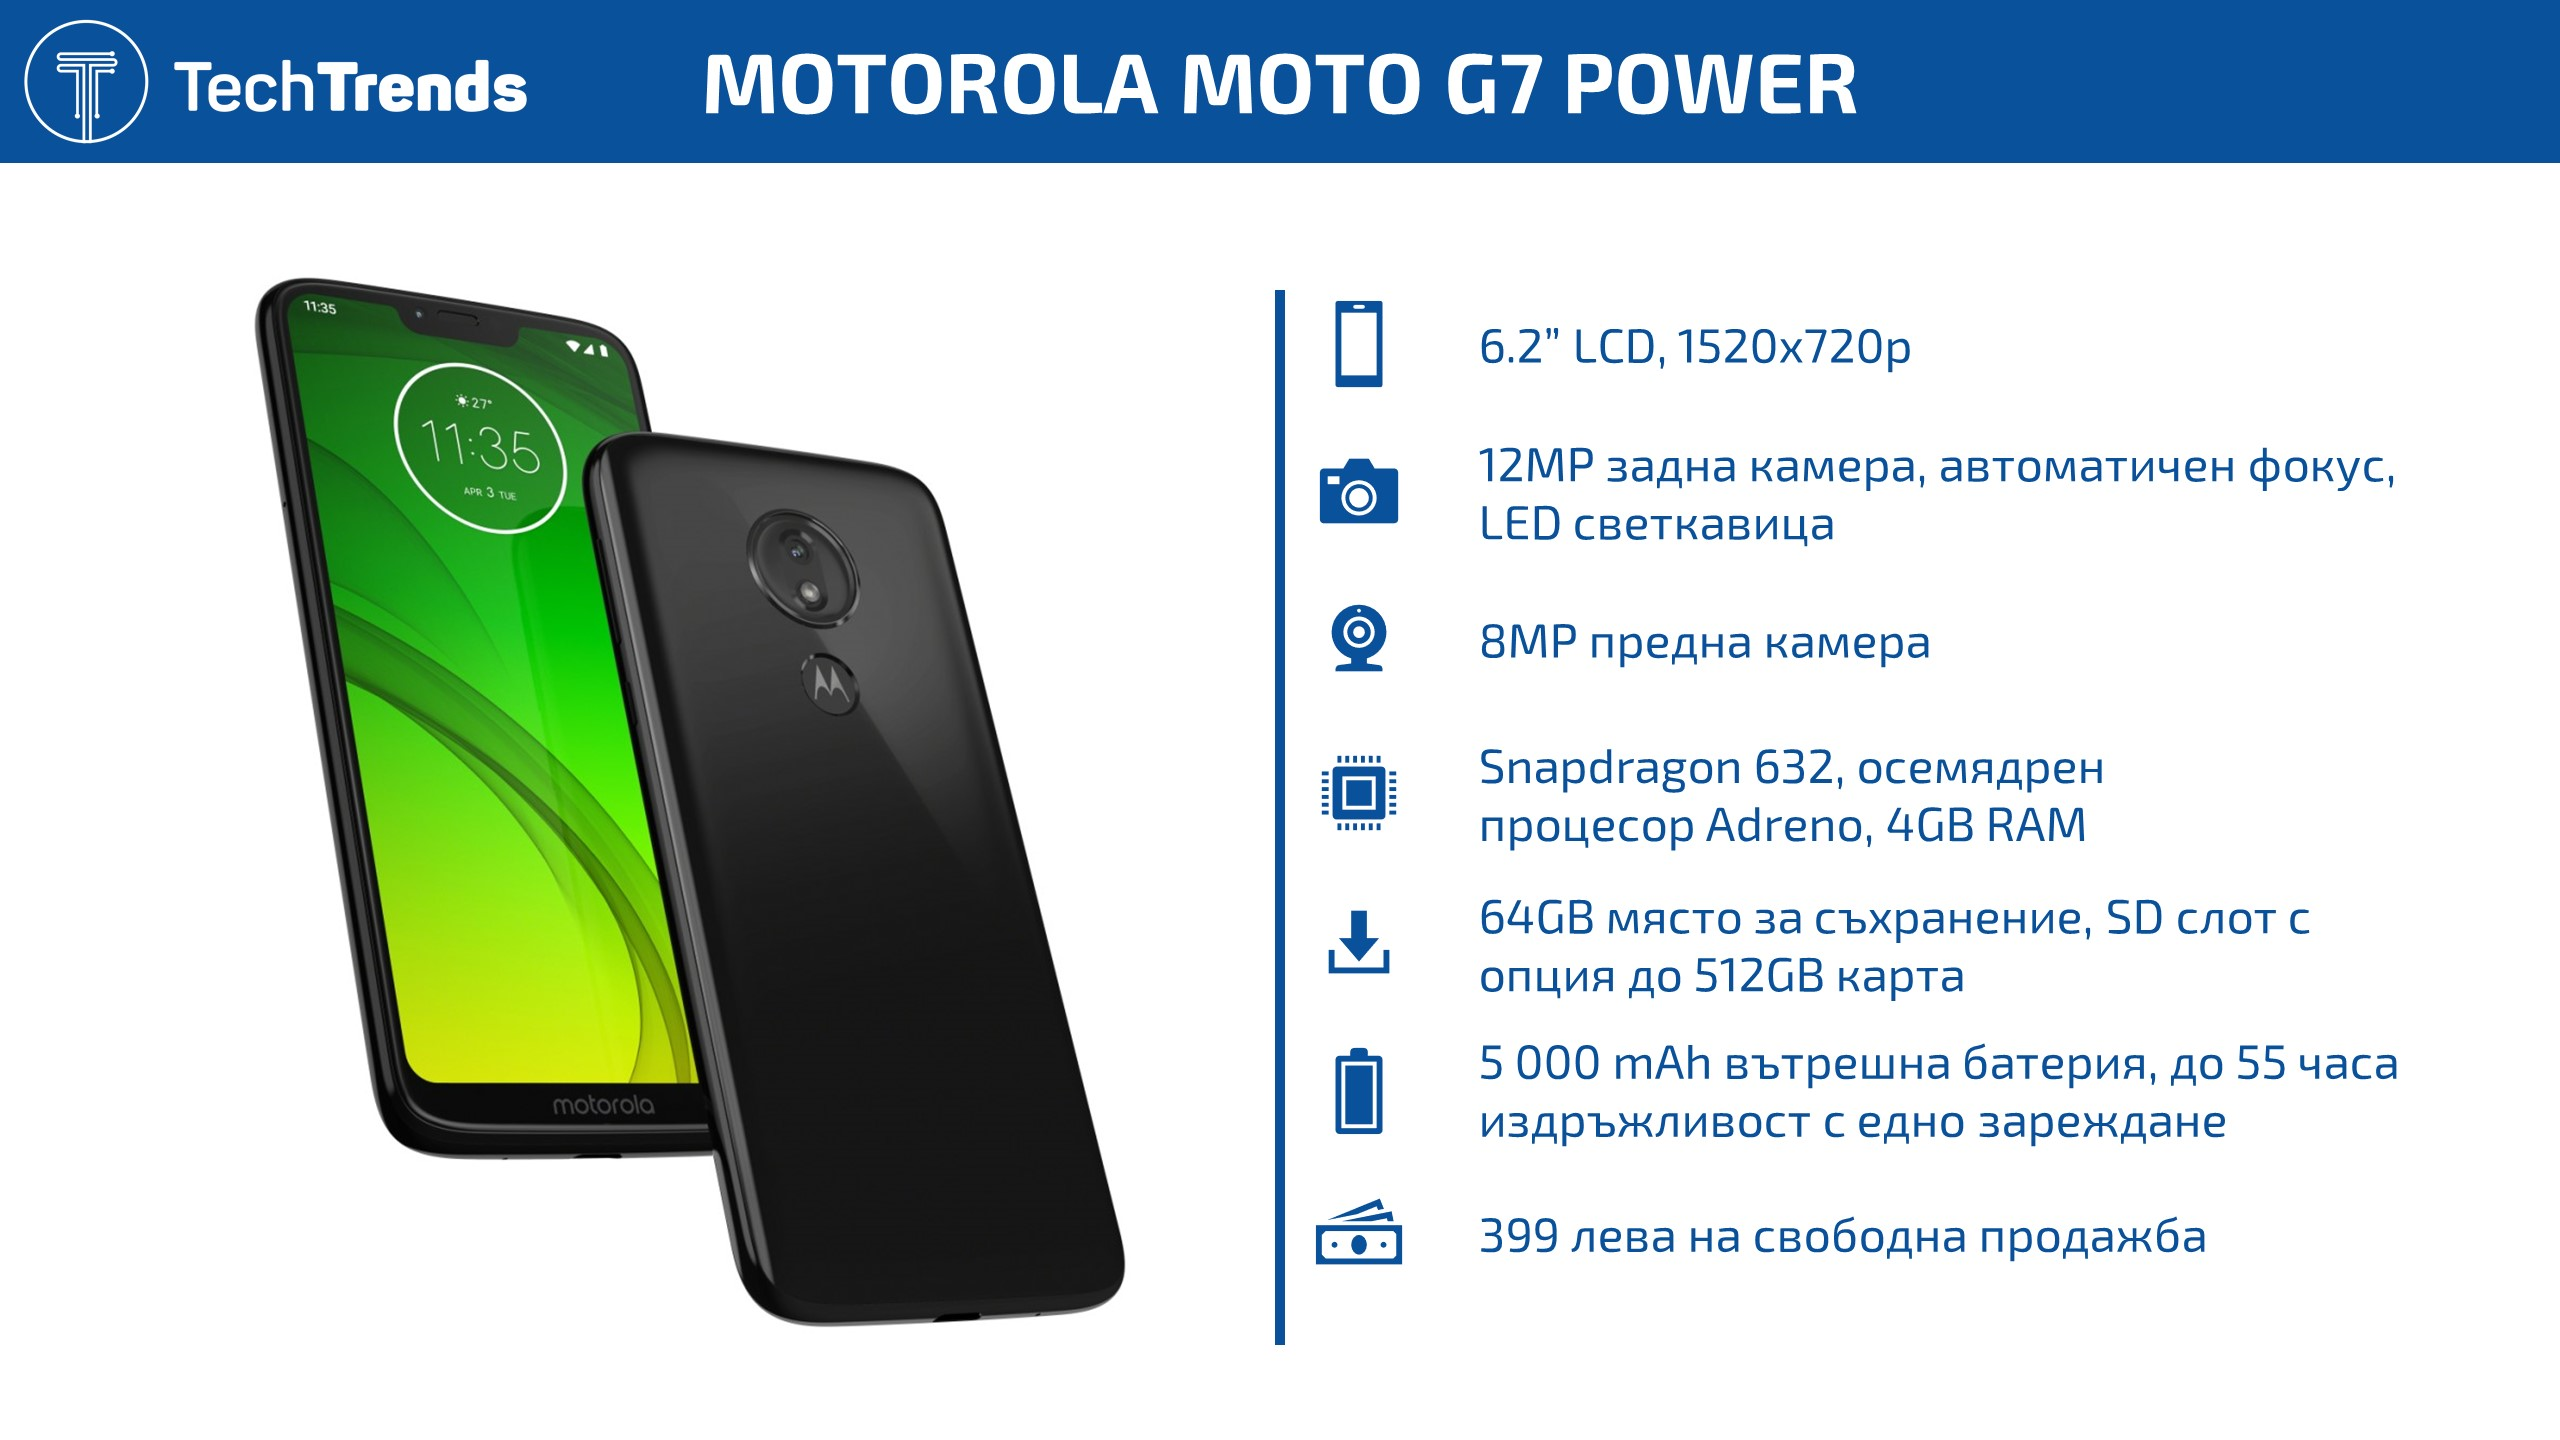 Moto G7 Power Infographic